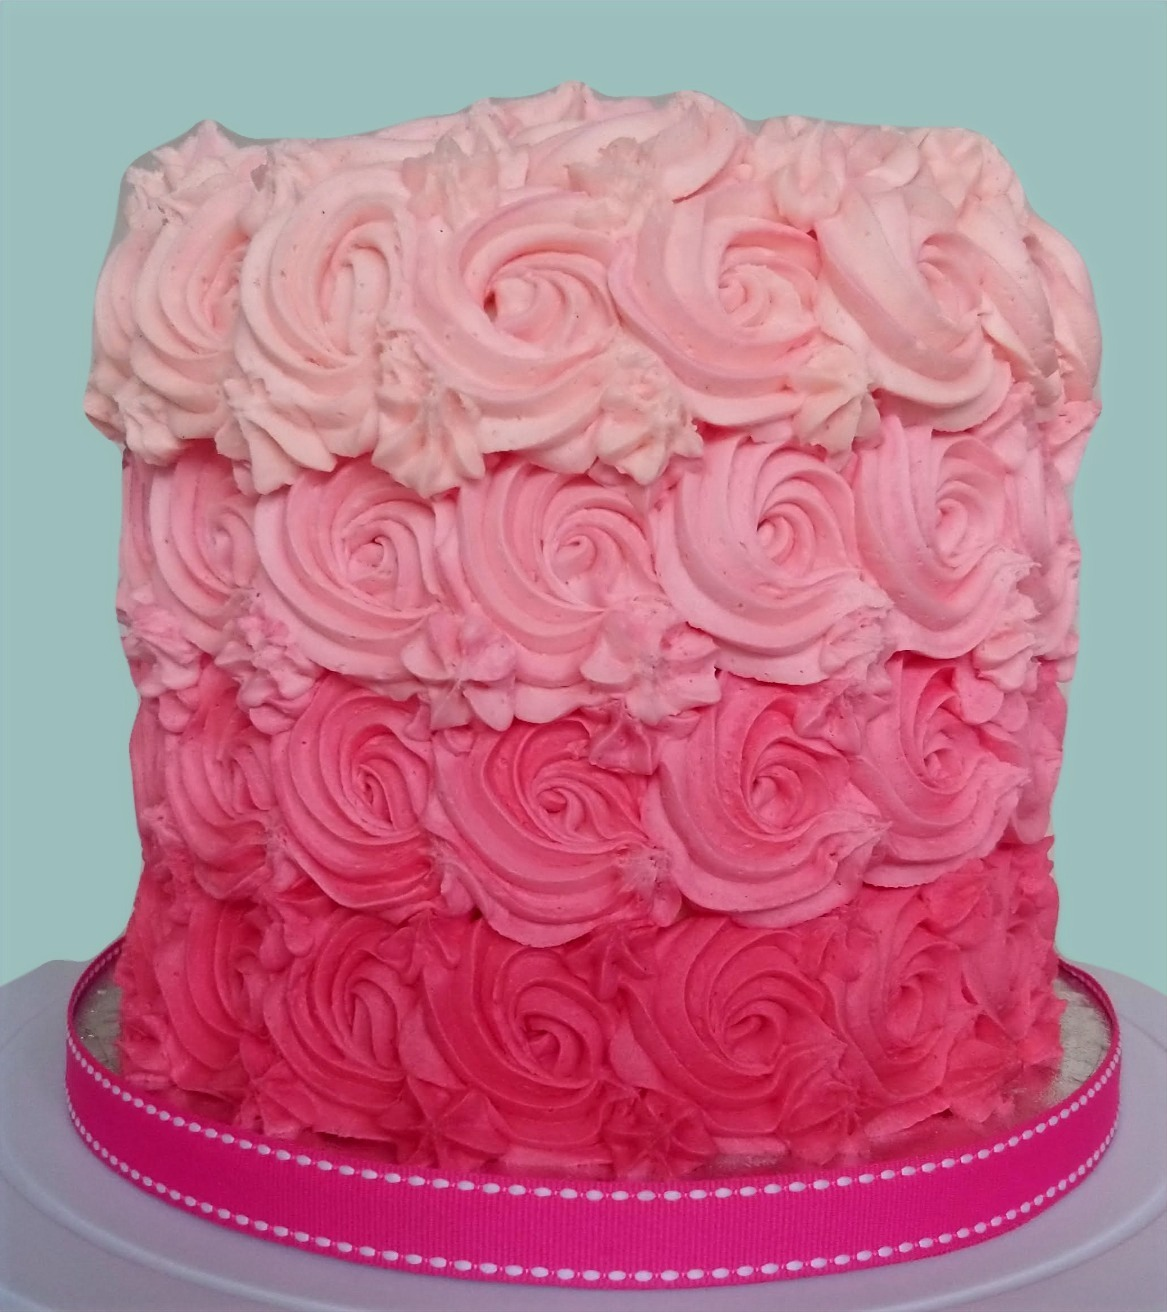 Ombre Rose Swirl Cake